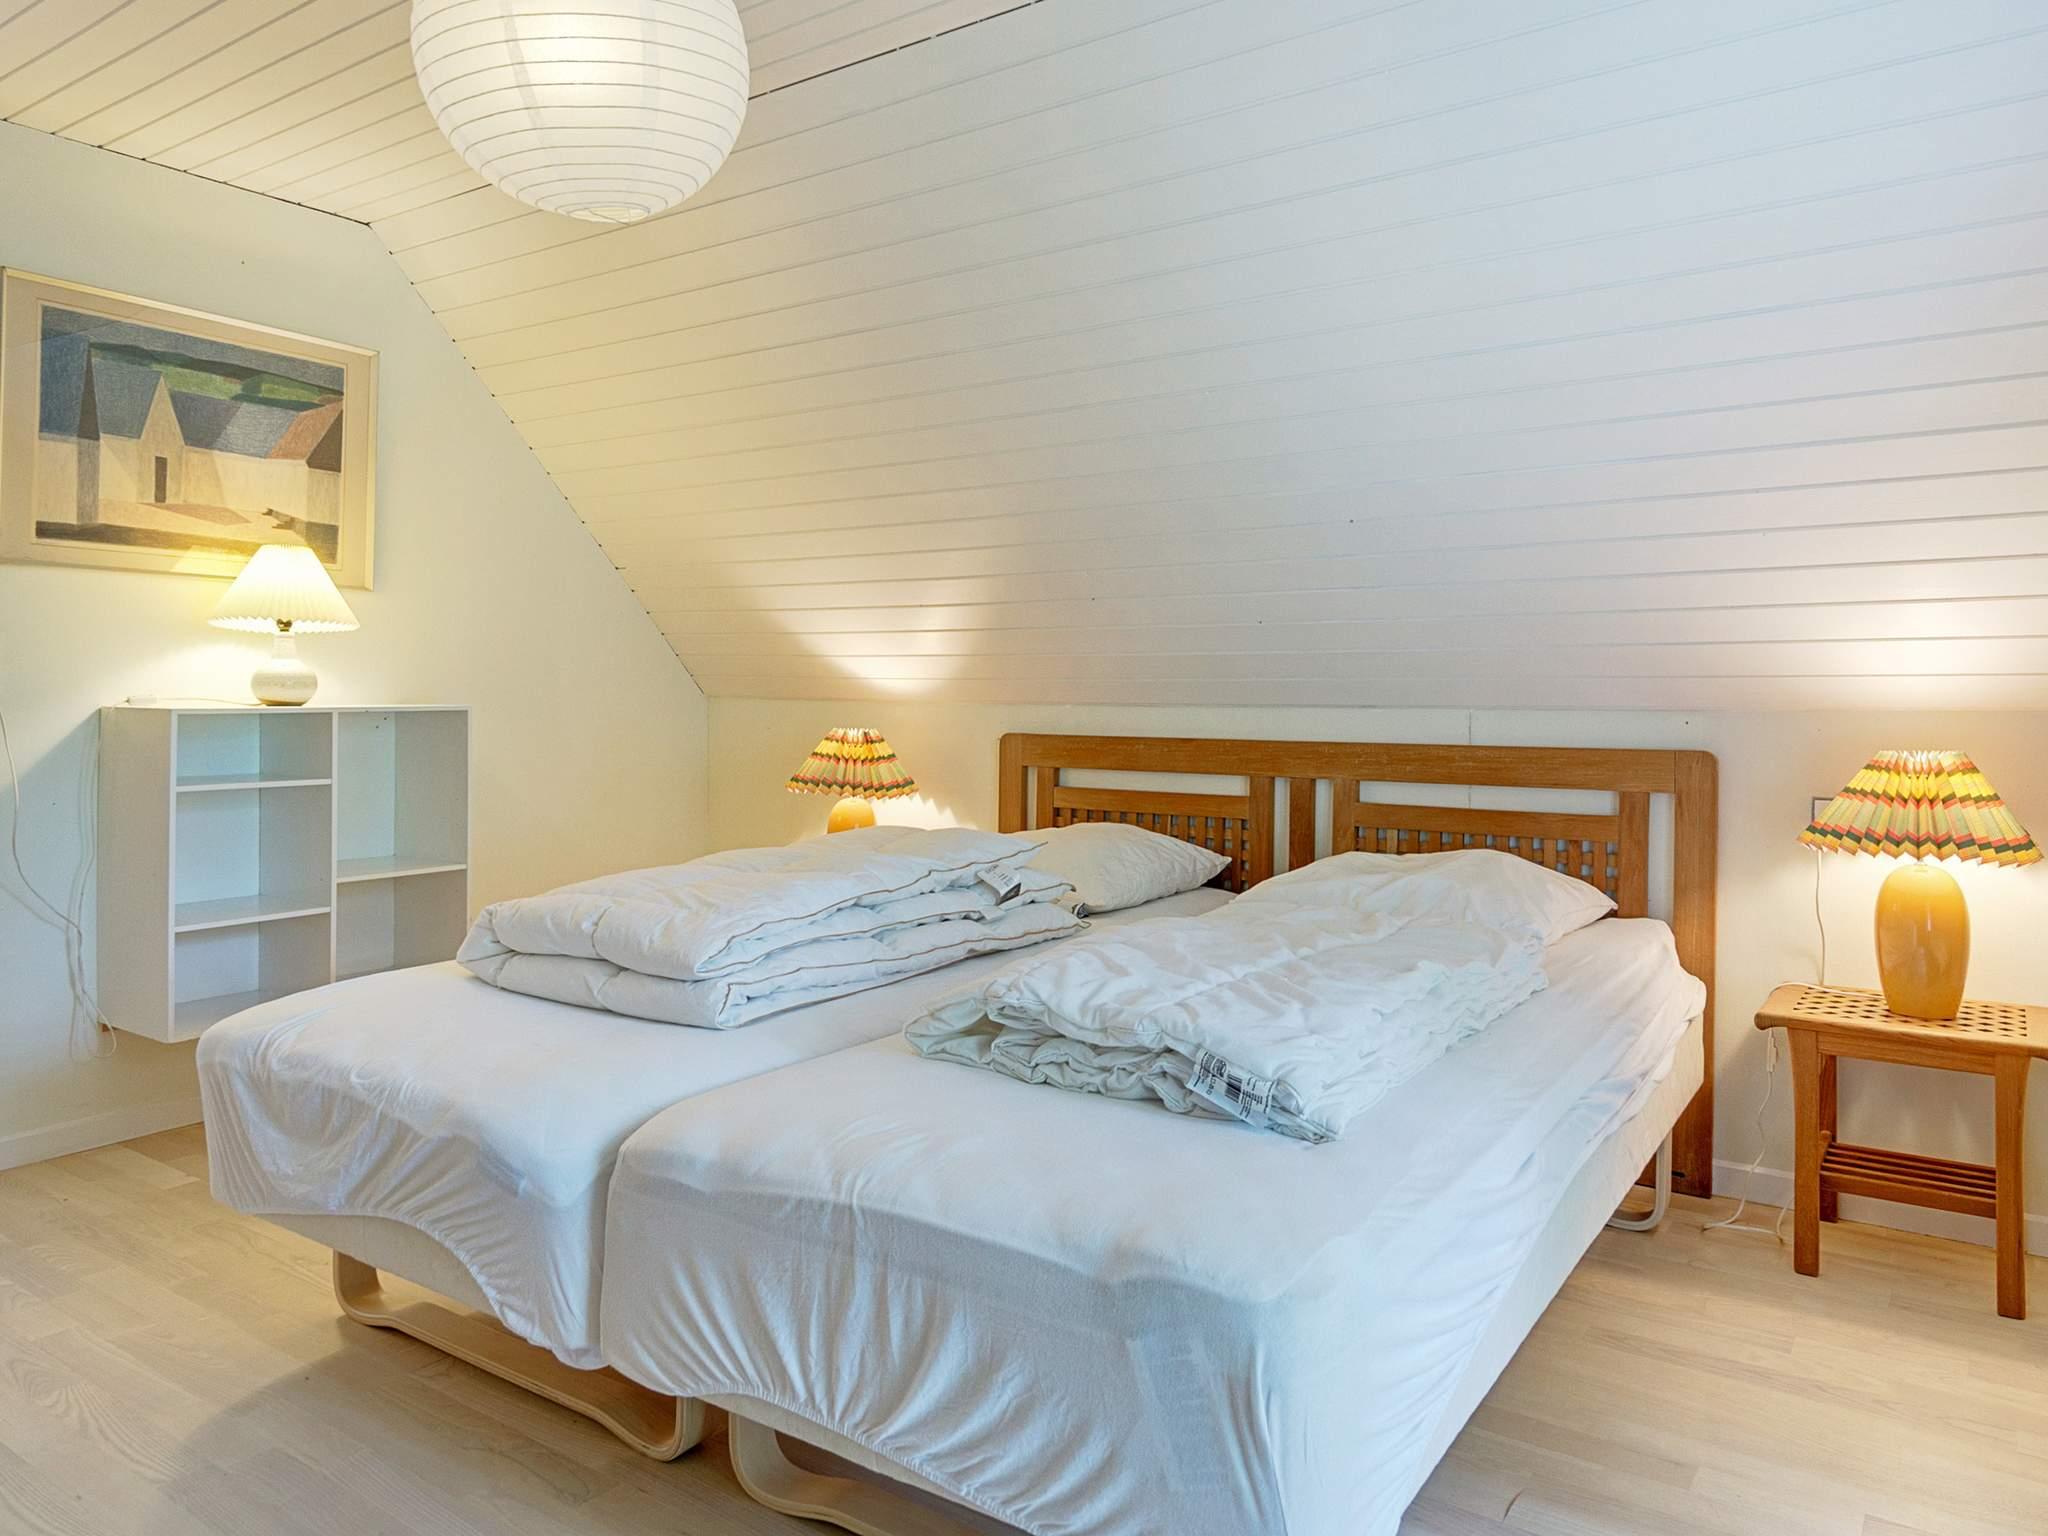 Ferienhaus Balka Strand (660138), Balke, , Bornholm, Dänemark, Bild 9